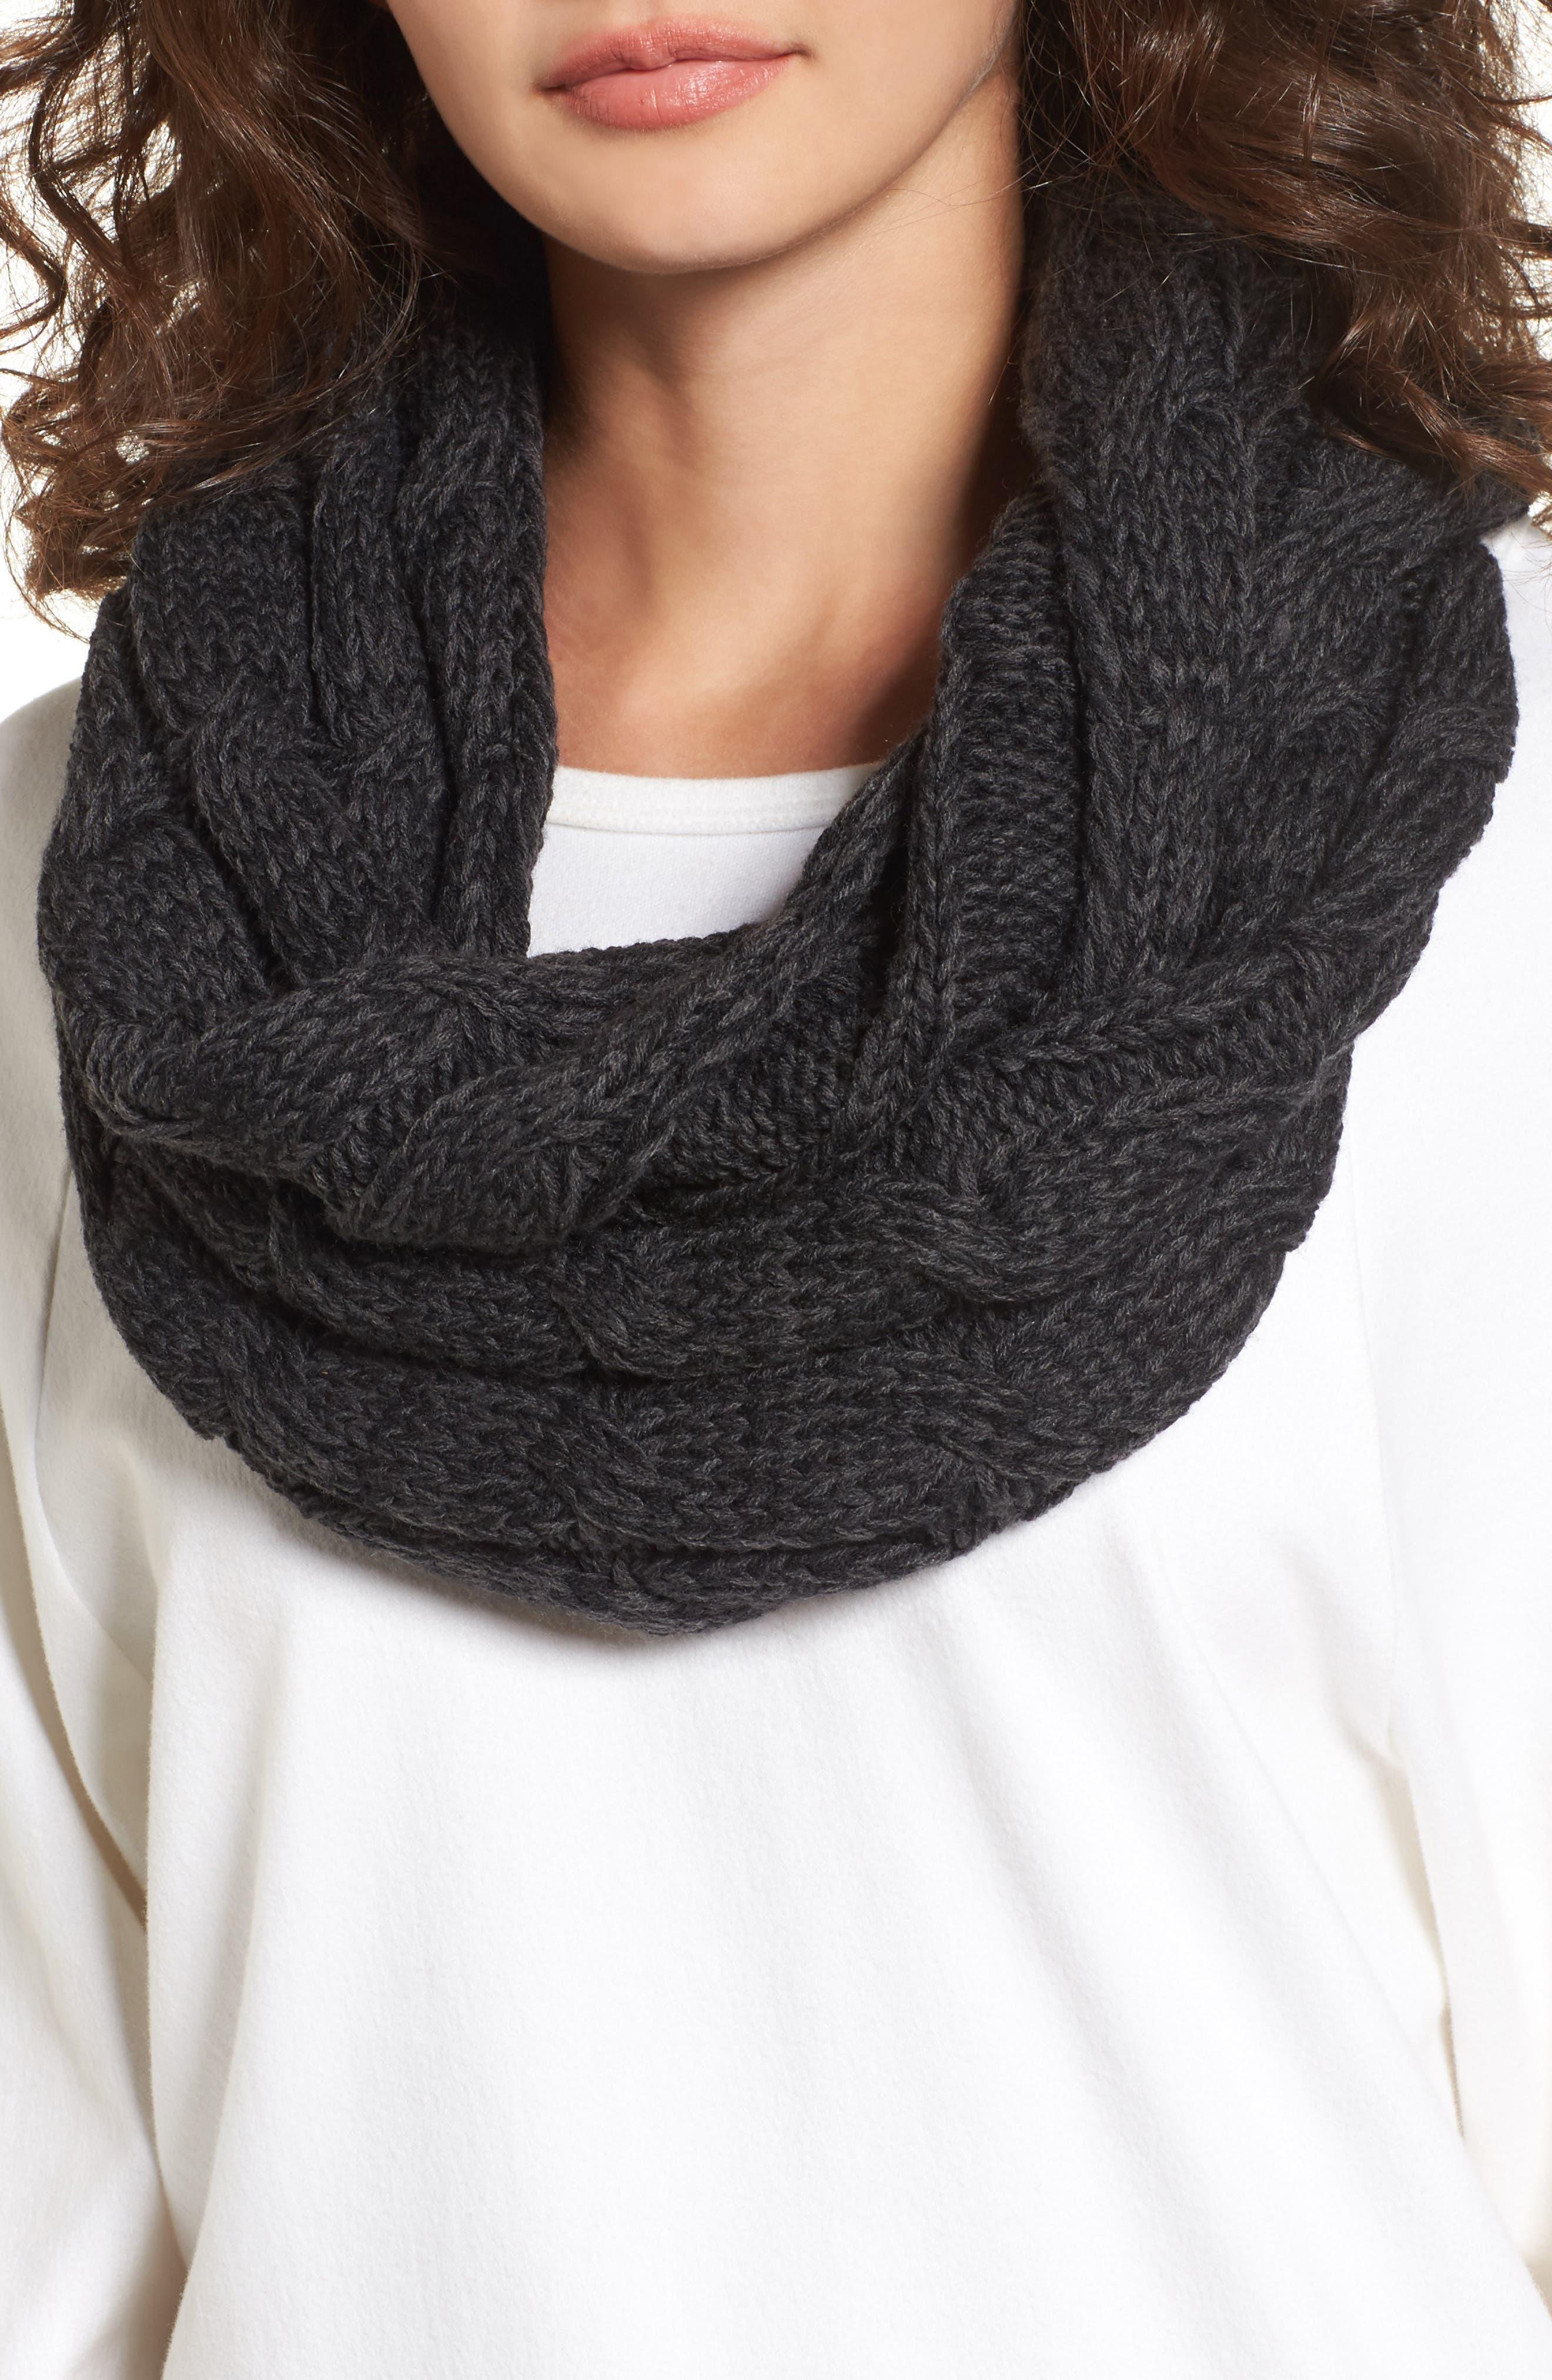 Main Image - CC Knit Infinity Scarf